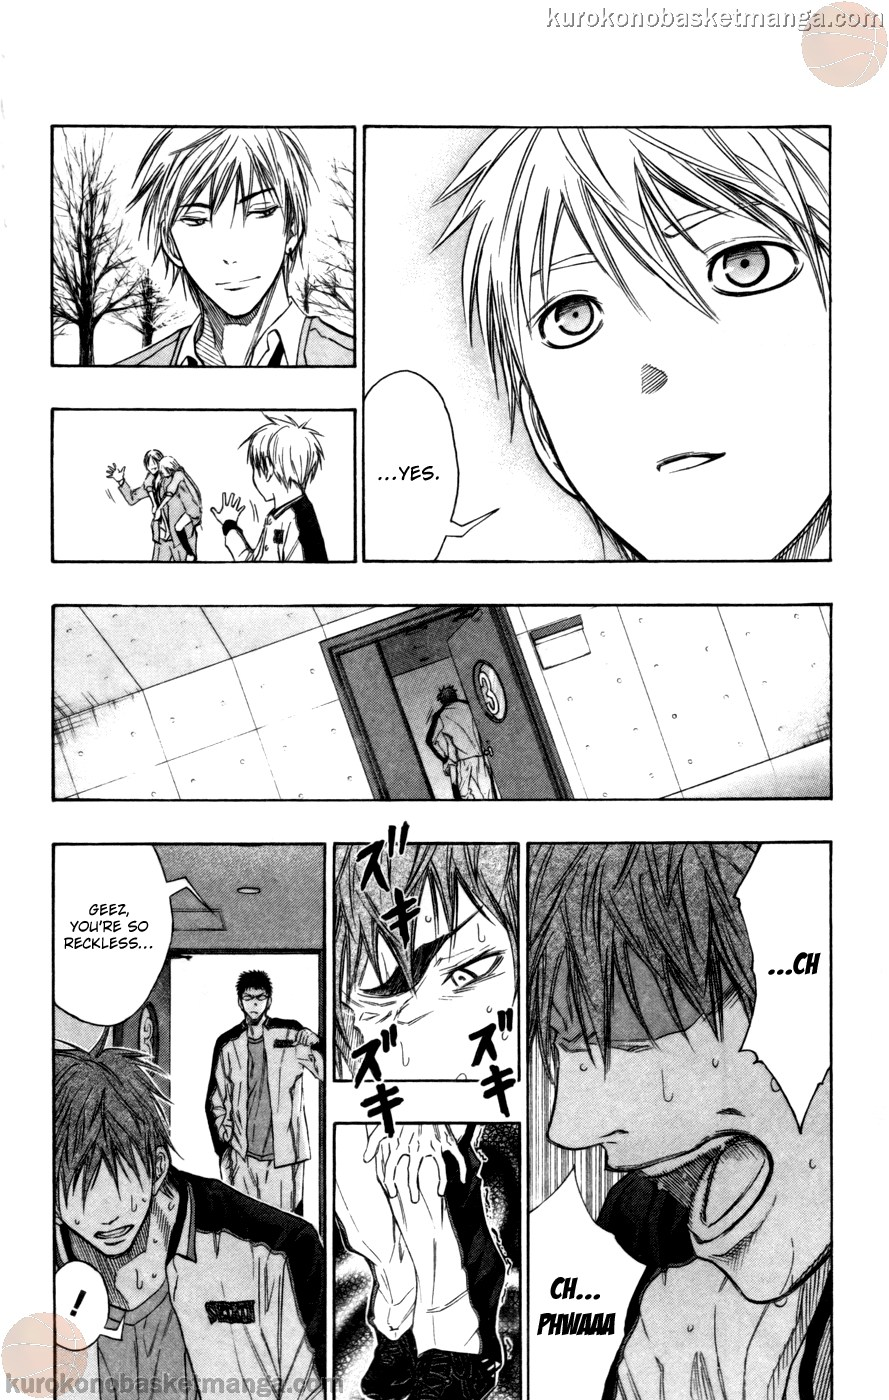 Kuroko no Basket Manga Chapter 93 - Image 18